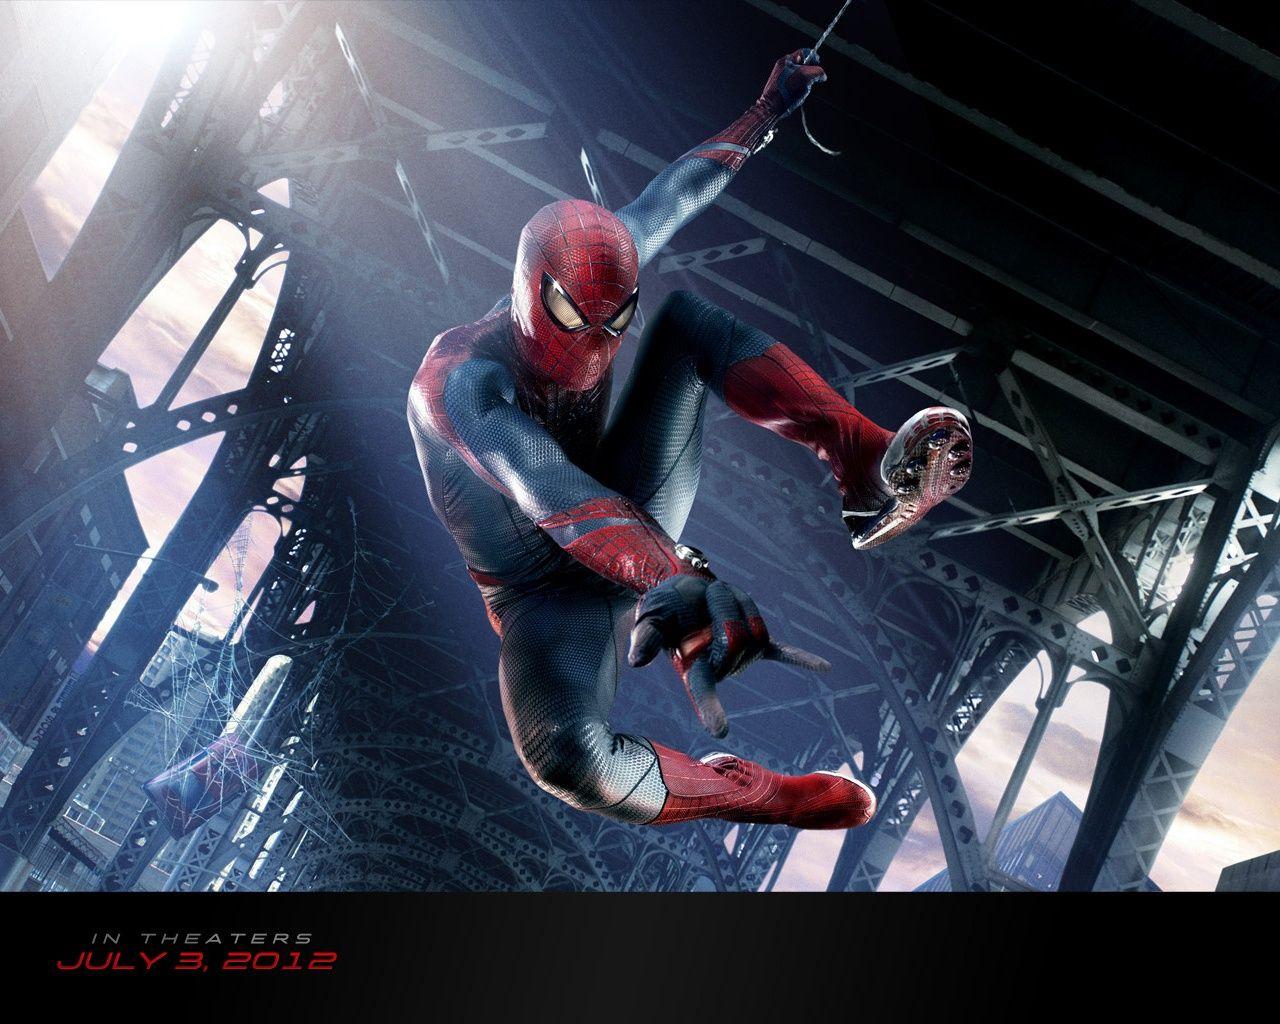 Amazing Spiderman Wallpaper Hd Widescreen 10 Mobile Wallpapers